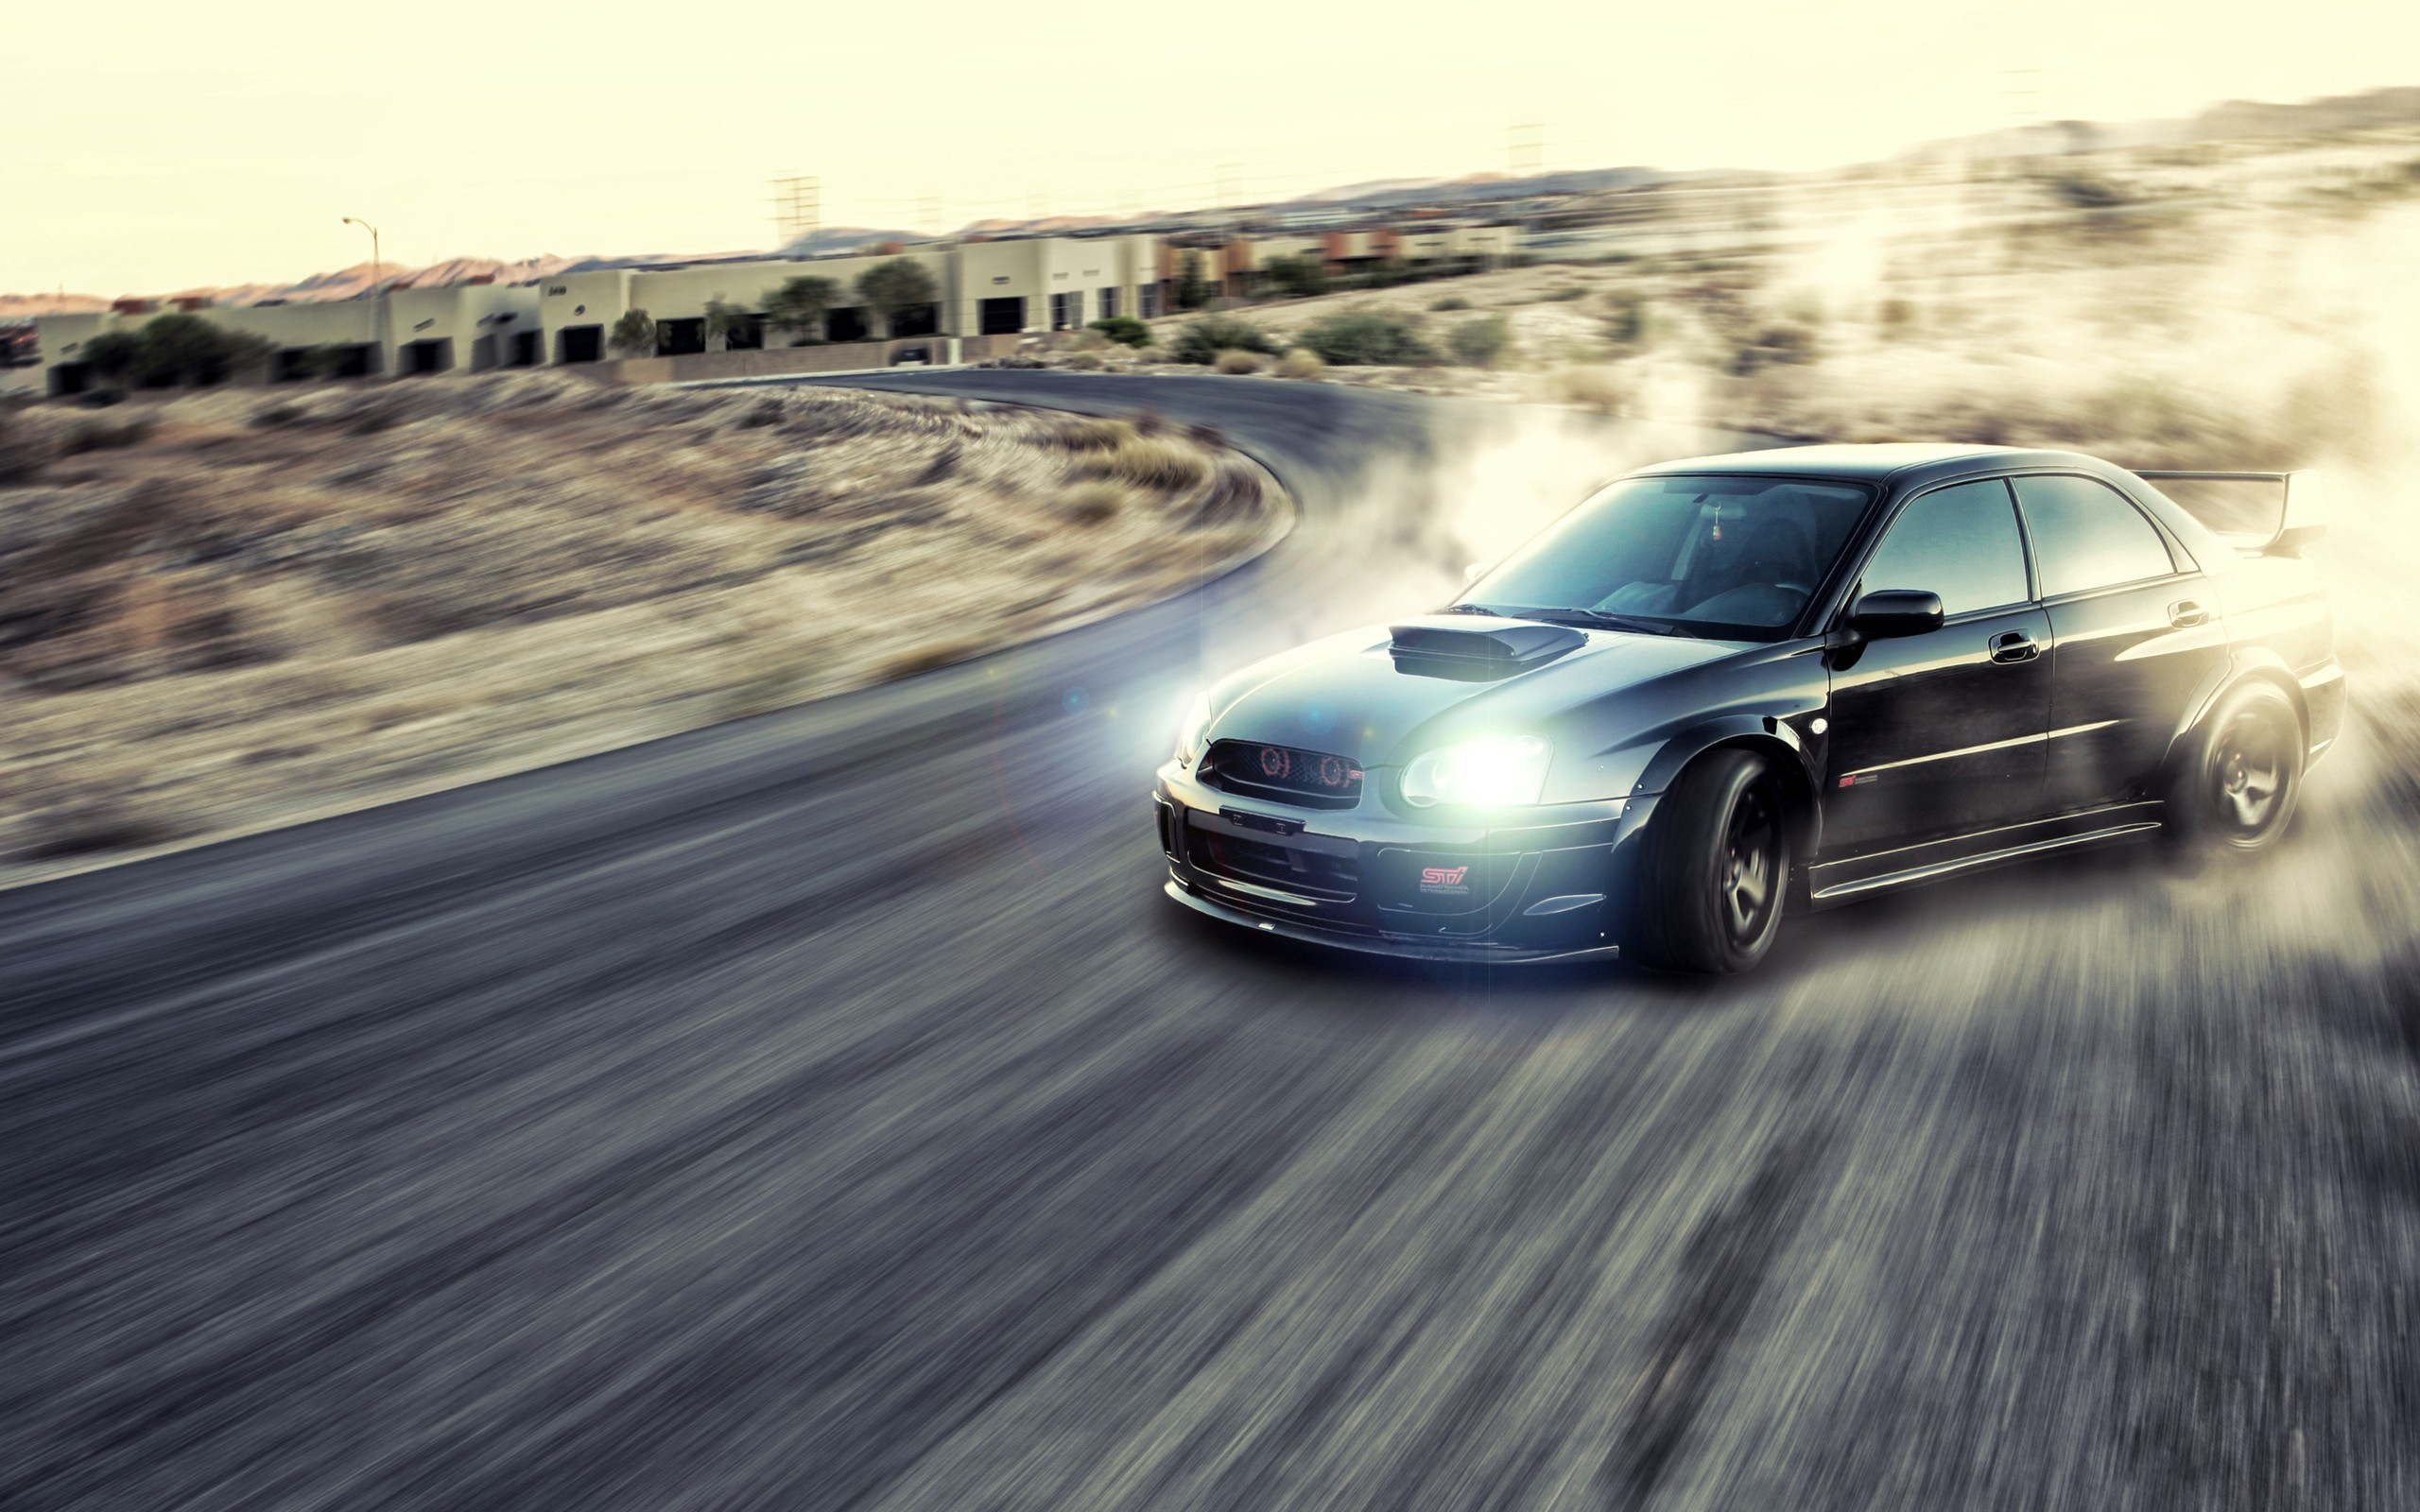 Subaru Drifting, HD Cars, 4k Wallpapers, Images ...